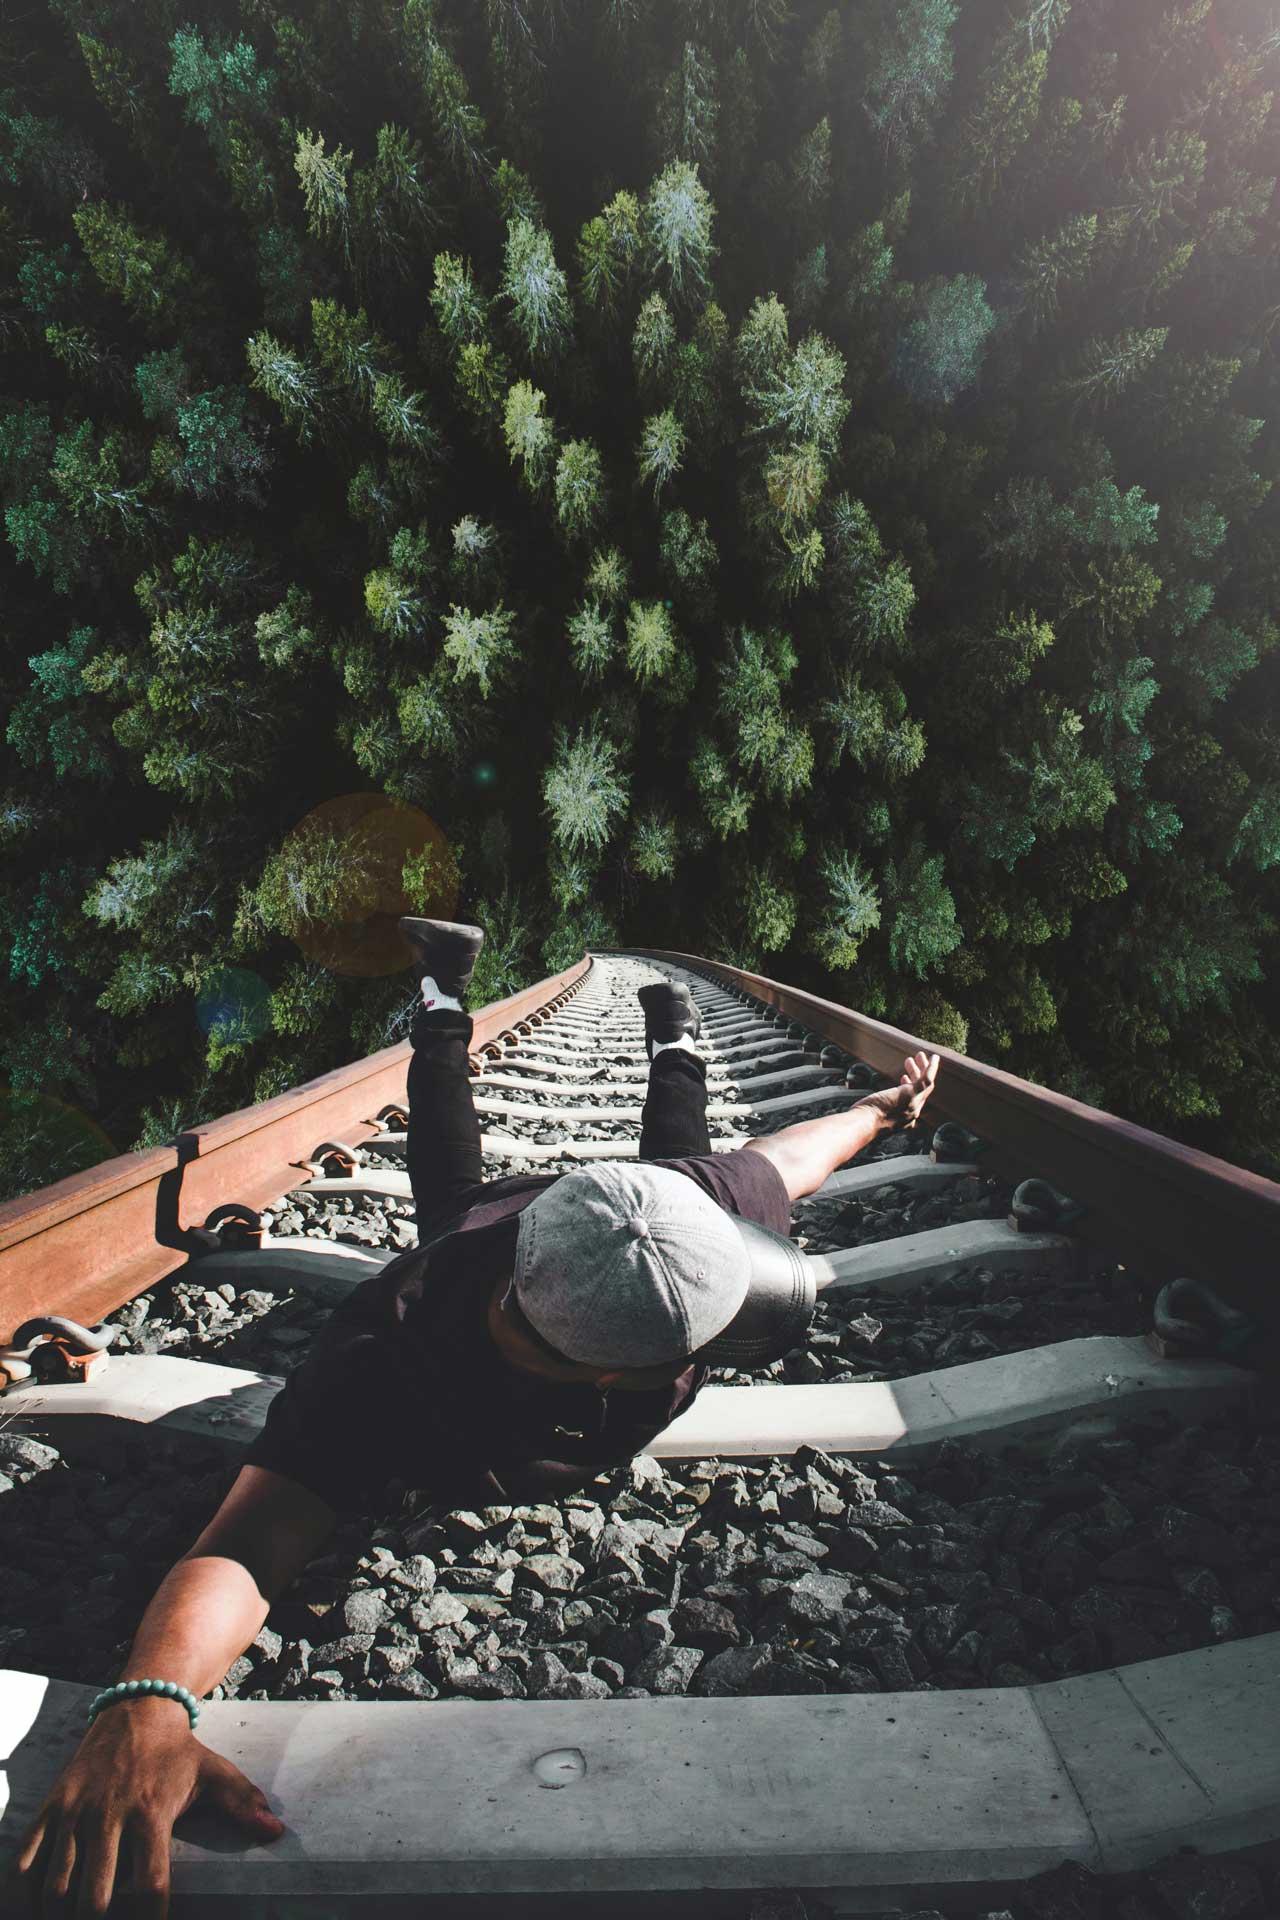 foto di Javon Swaby da <a href='https://www.pexels.com/it-it/foto/adulto-alberi-ambiente-appeso-1732370/' target='_blank'>Pexels</a>